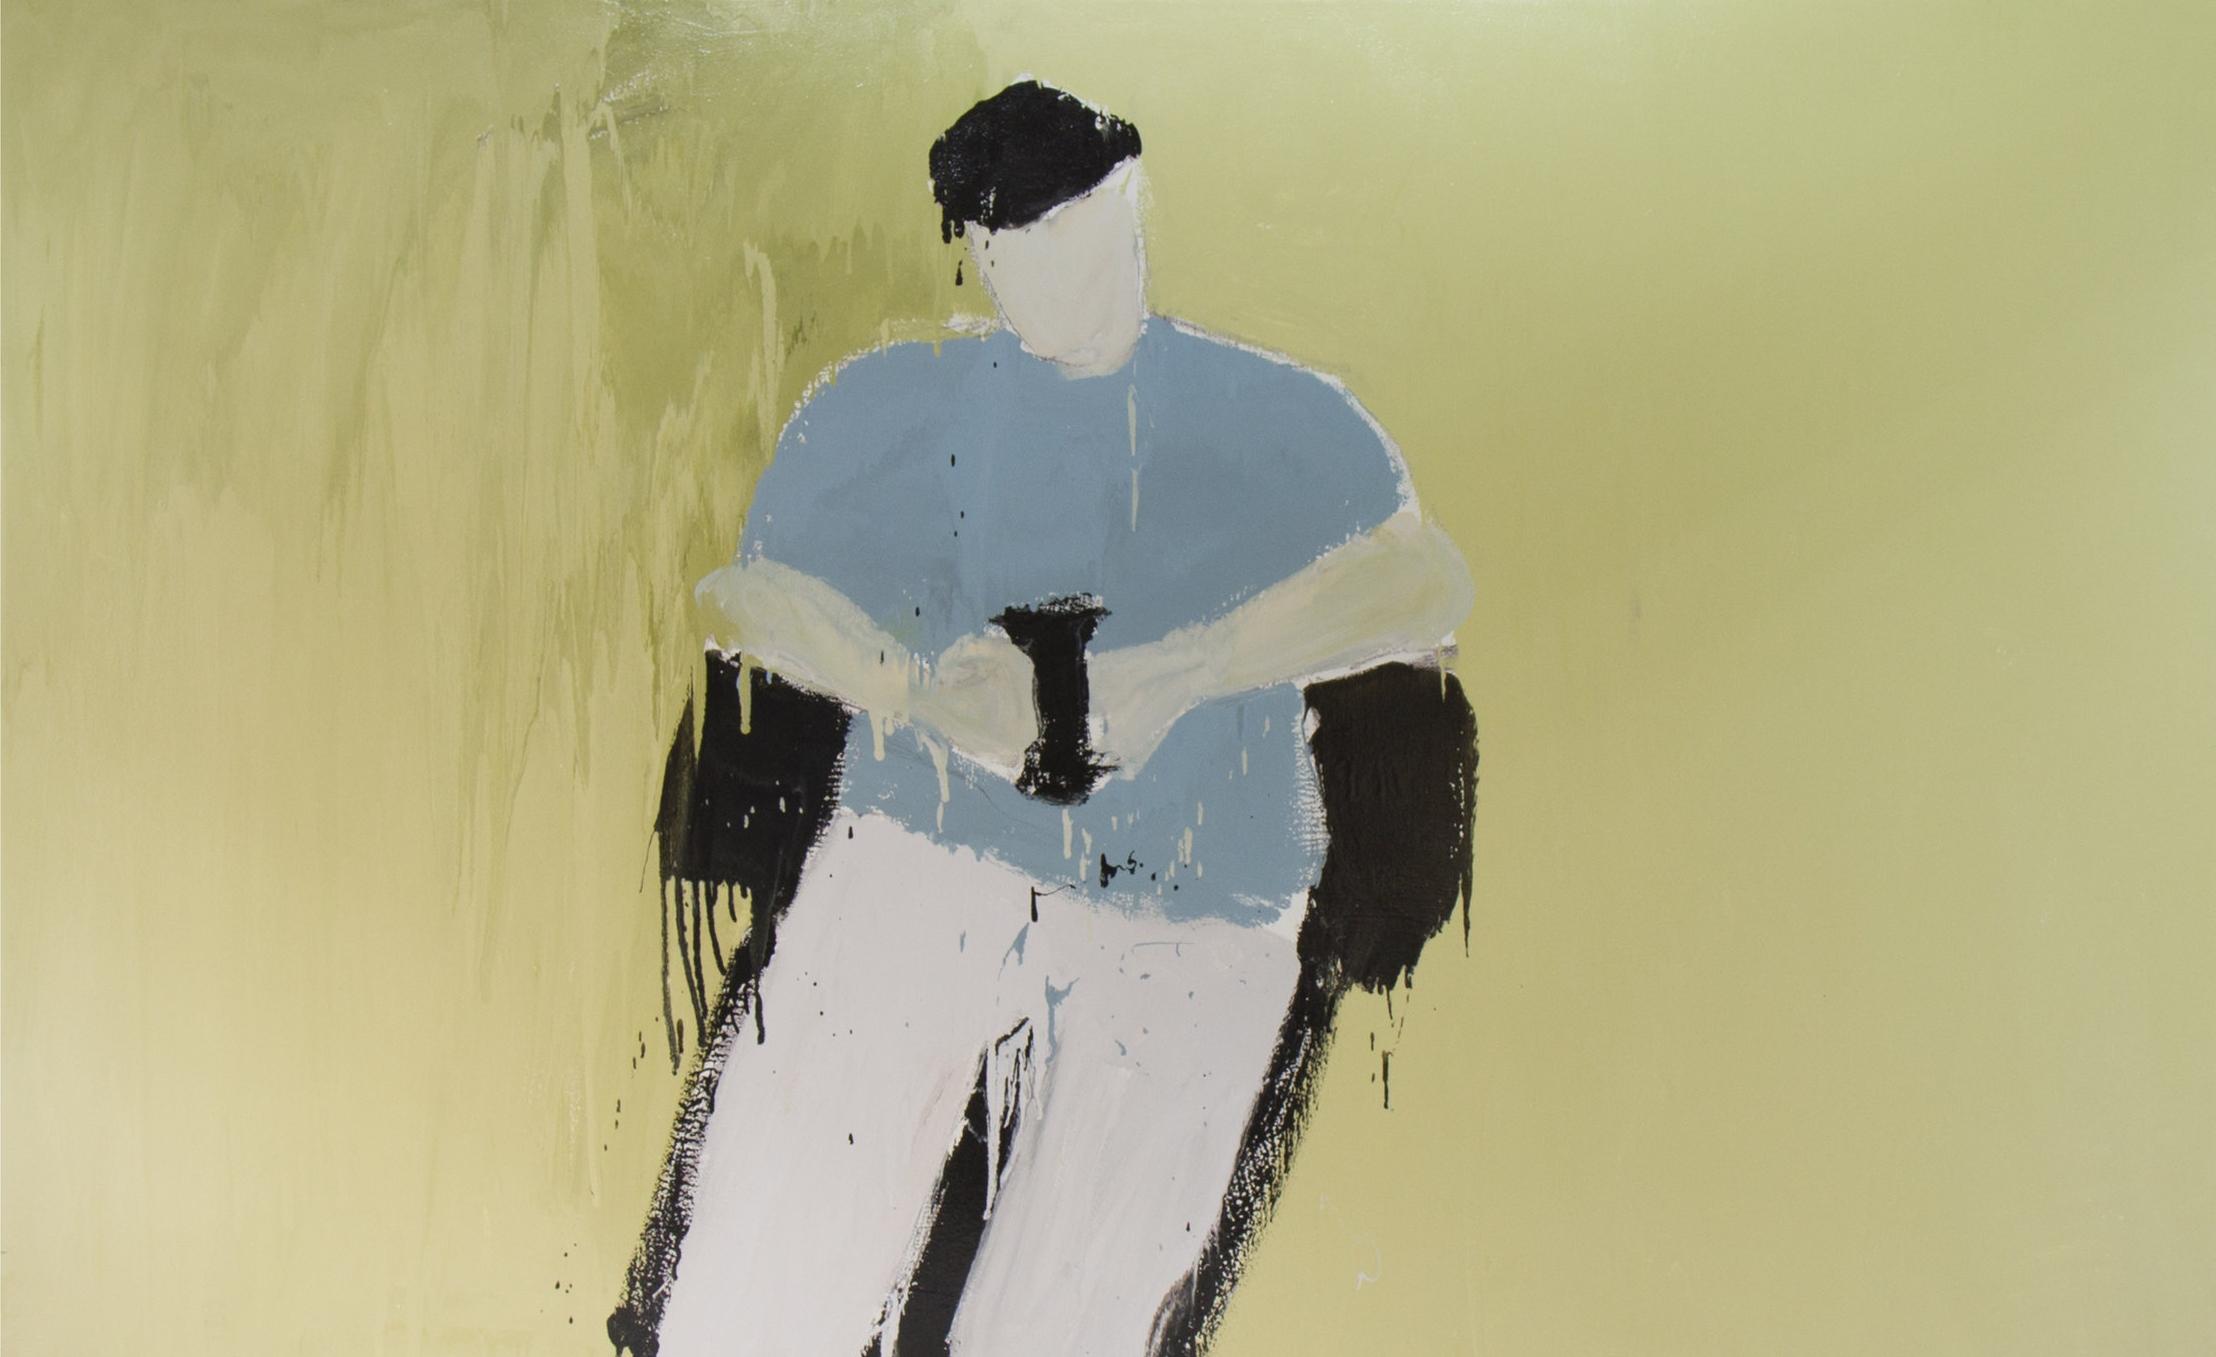 Aziz II, 2016, enamel paint on canvas, 152 x 244 cm